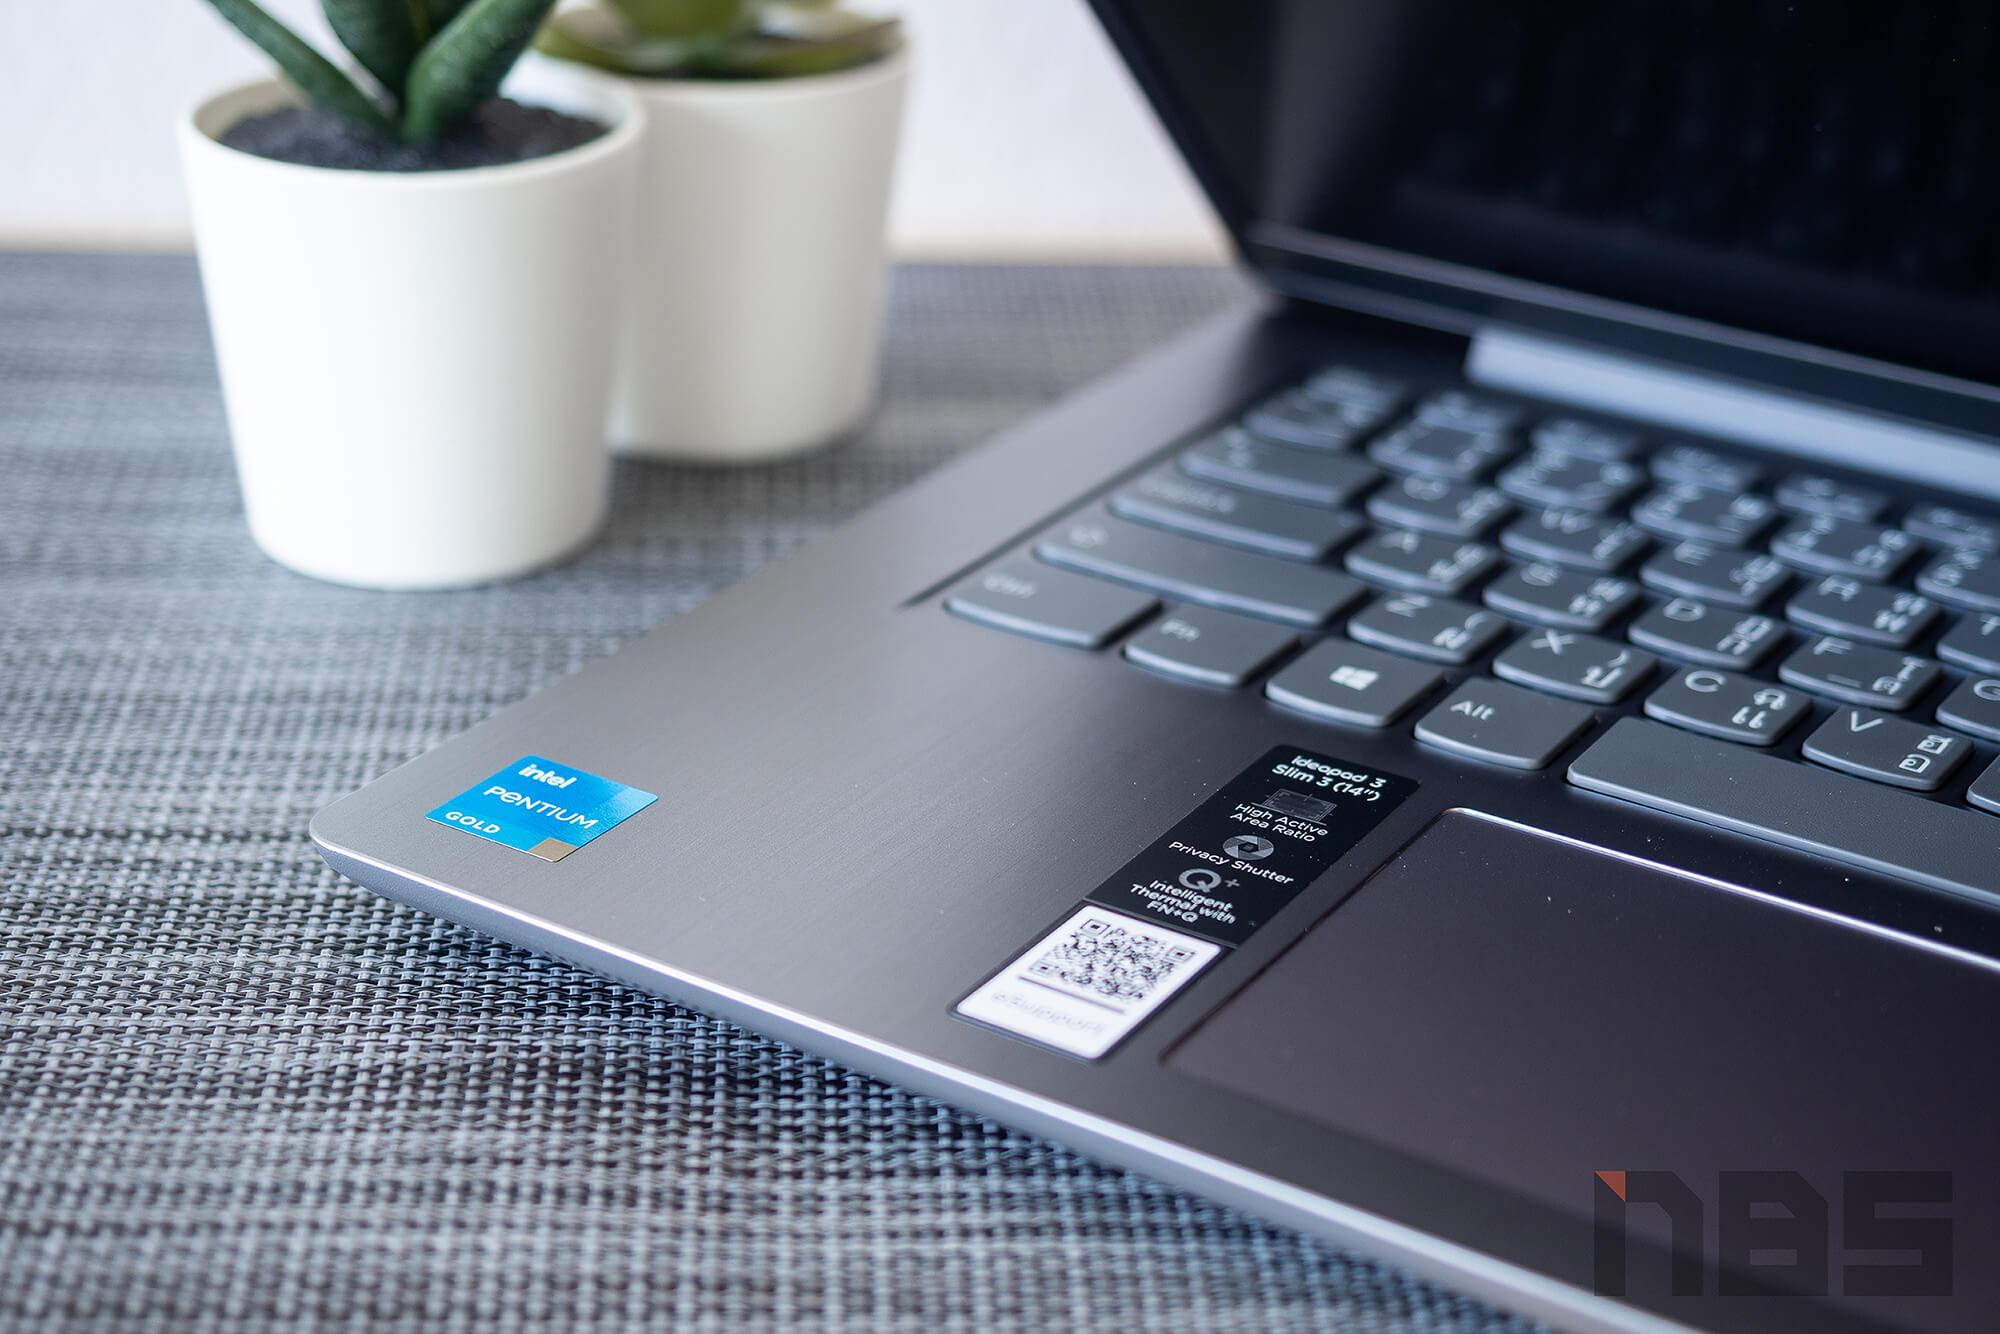 Review Lenovo IdeaPad Slim 3i pentium NotebookSPEC 46